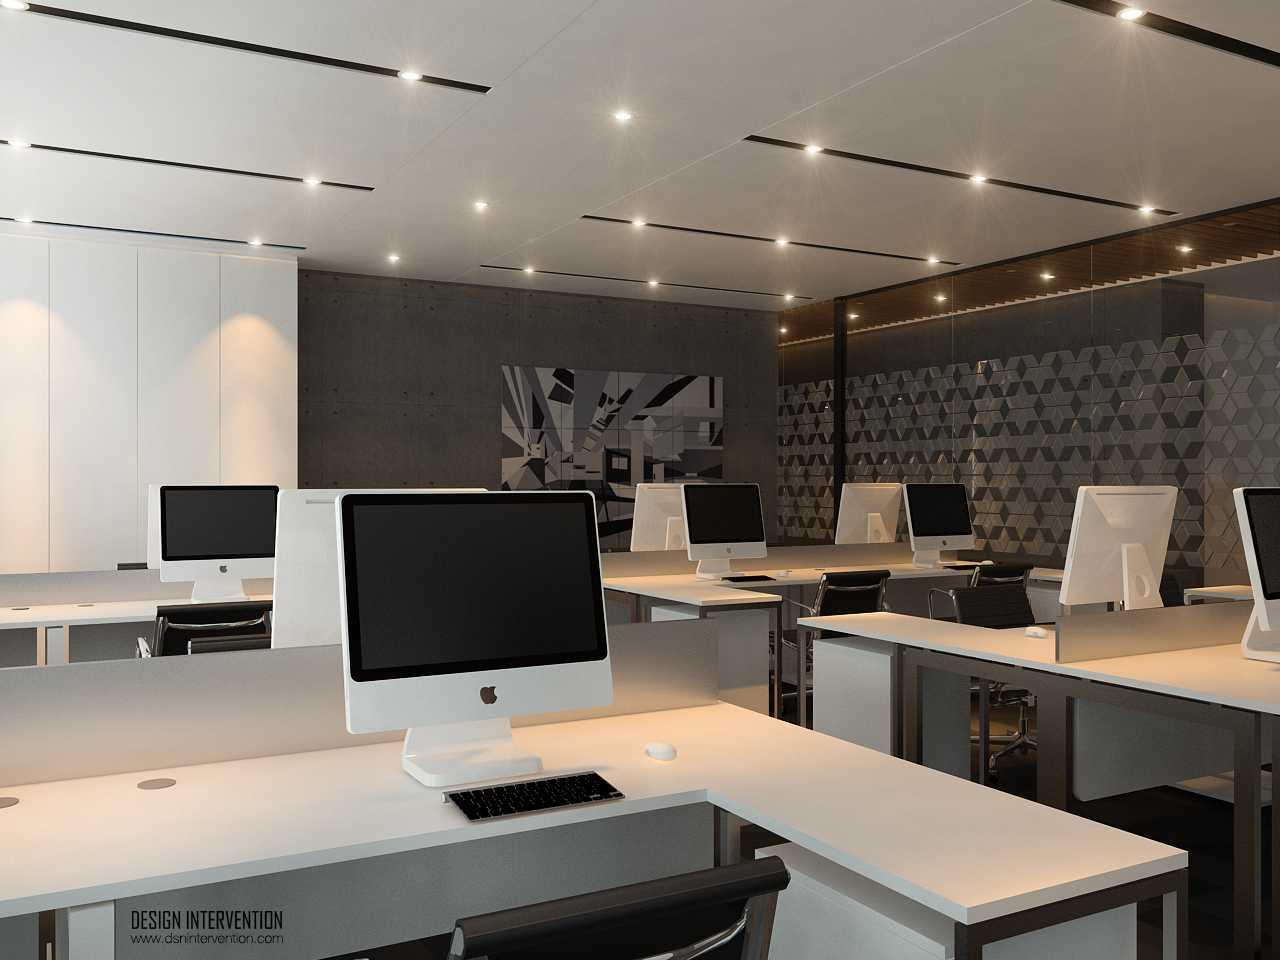 Design Intervention Mitsubishi Hq Office Tebet Tebet General-Working-Area-View-2  14980